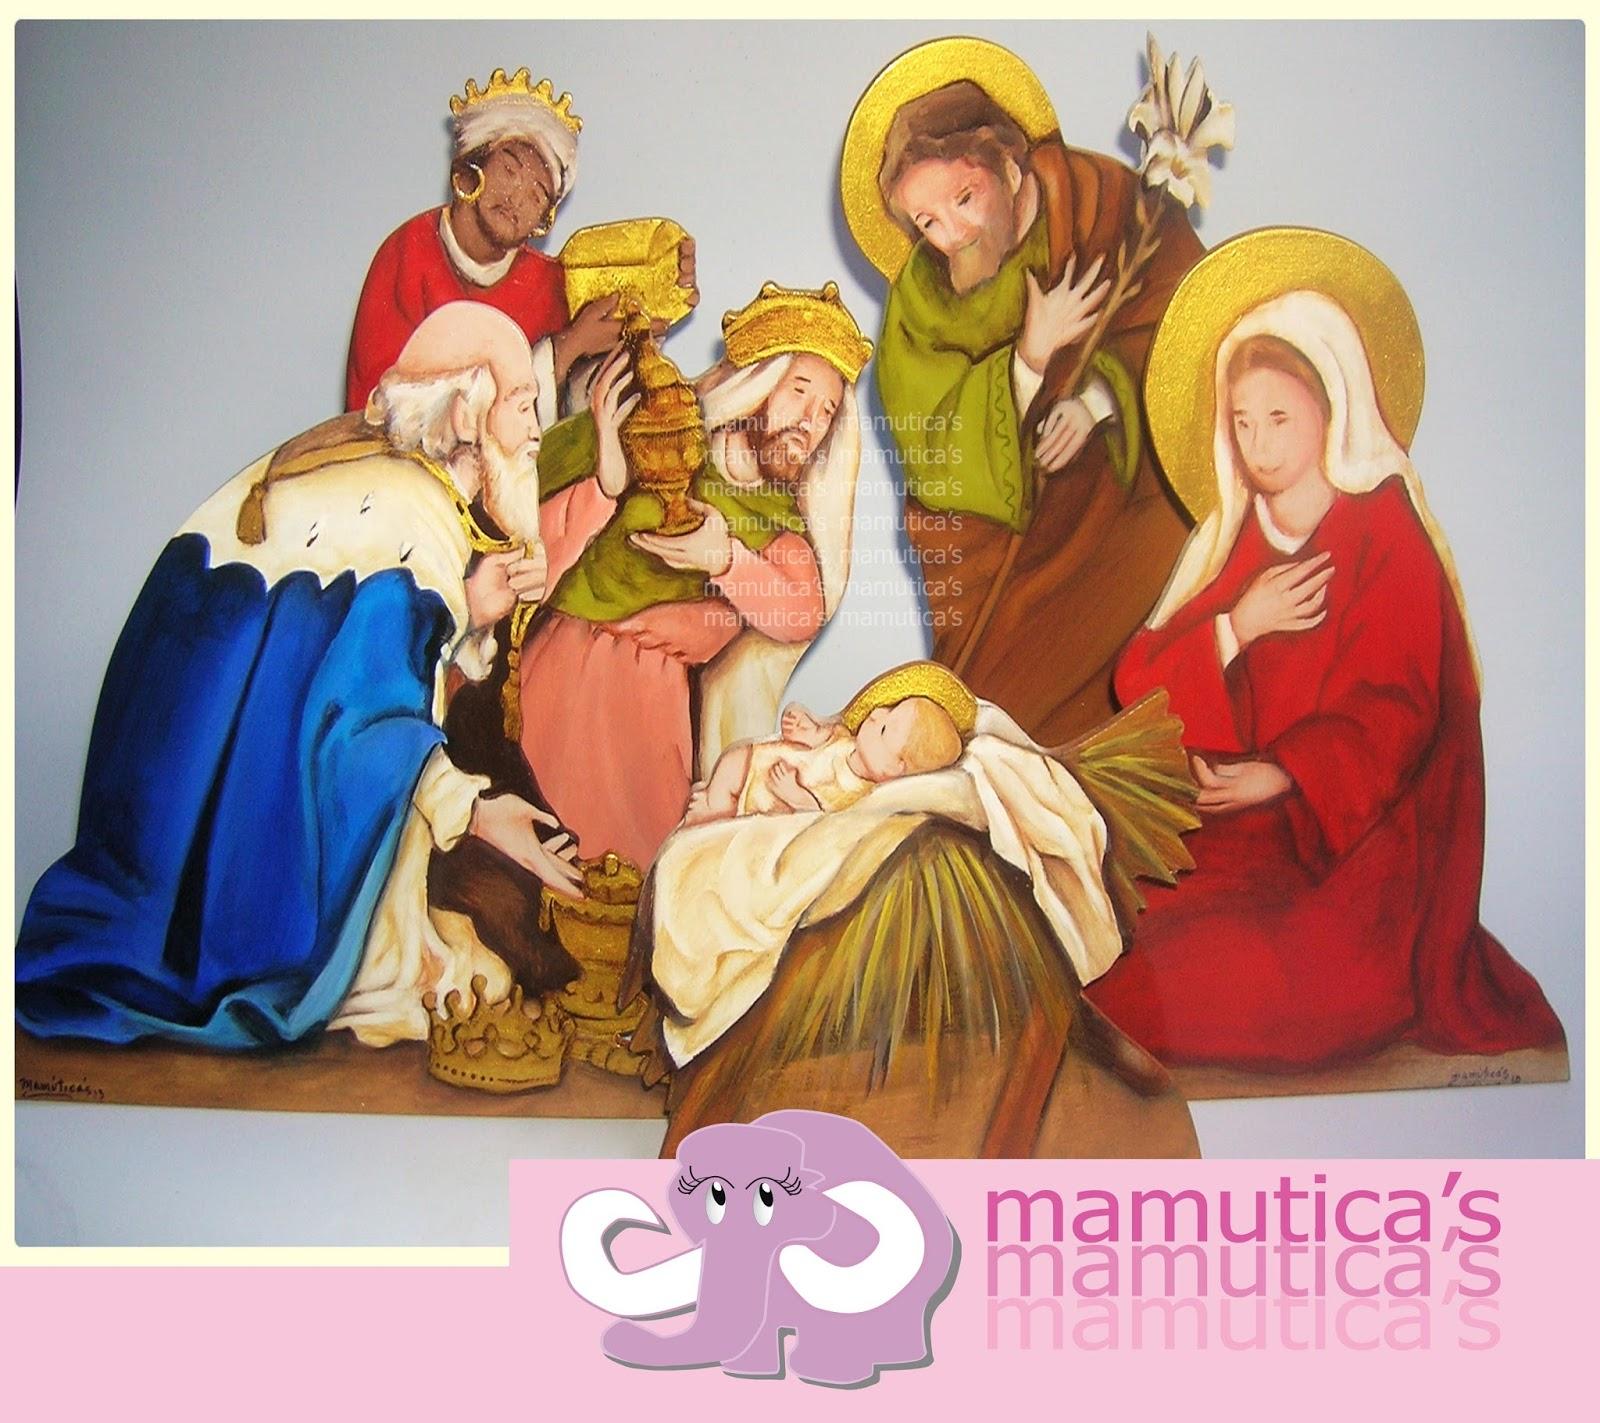 Mamutica's: Pesebre en MDF pintado a mano